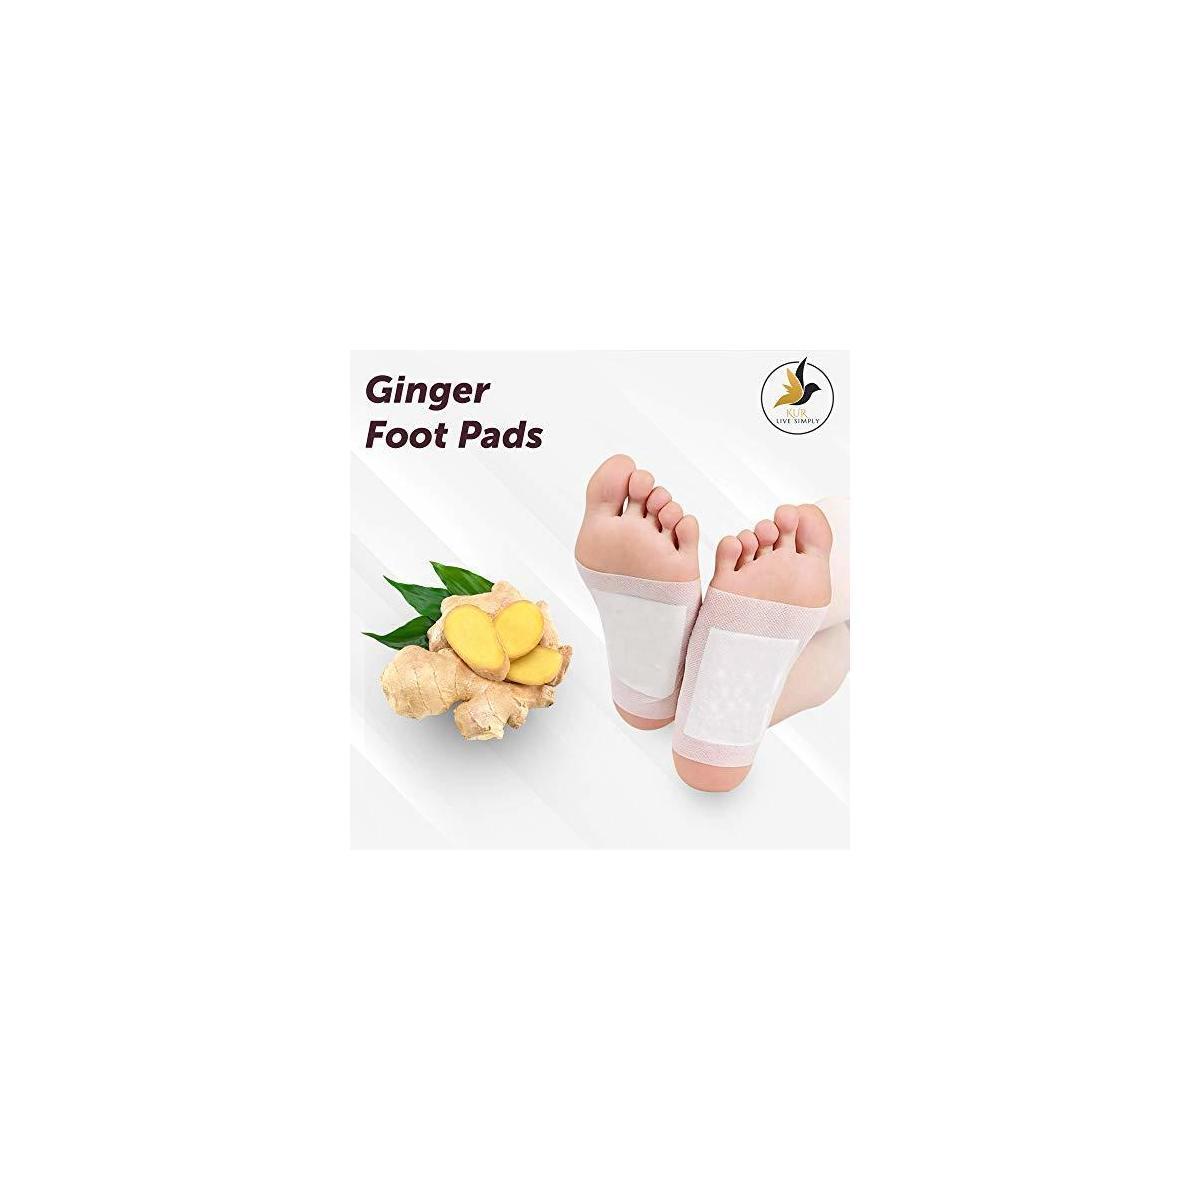 Ginger Foot Pads 20 PCS + Bonus Ginger Bath Soak Tablets 2 PCS   Ginger Foot Patch   Sleeping Pad   Better Sleep Patch   Pure Natural Ginger Powder and Bamboo Vinegar Premium Ingredients Feet Pads